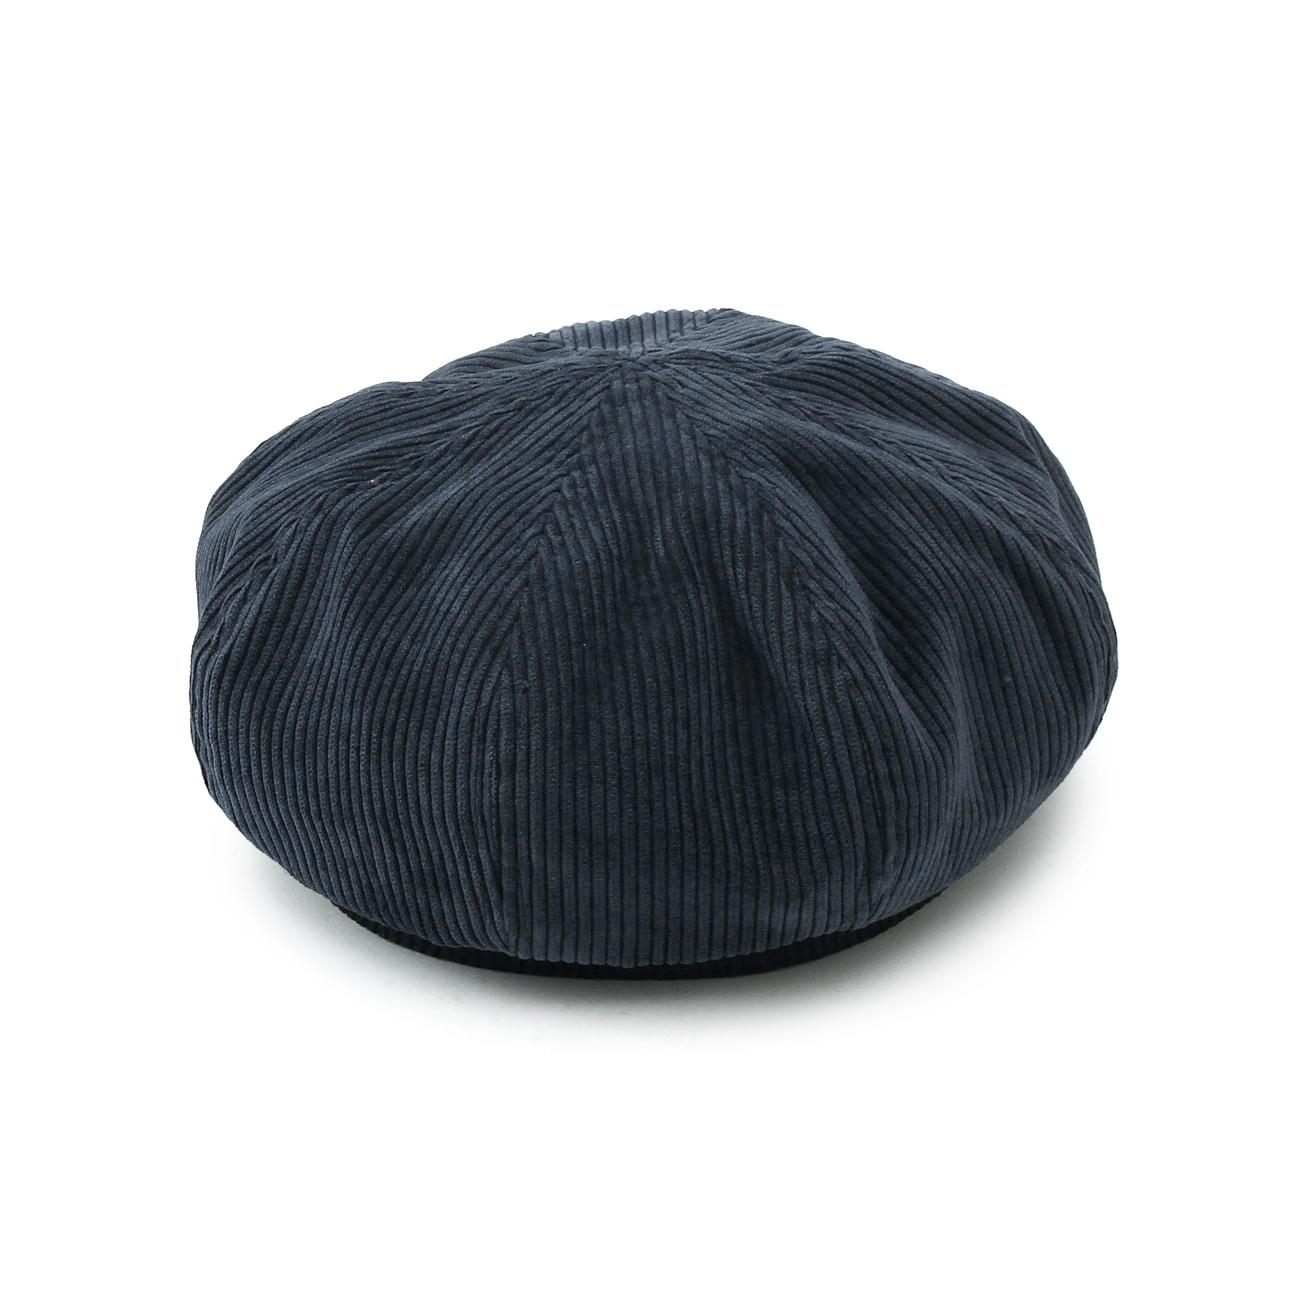 【OPAQUE.CLIP (オペークドットクリップ)】コーデュロイベレー帽レディース 帽子 ハンチング・ベレー帽 ネイビー